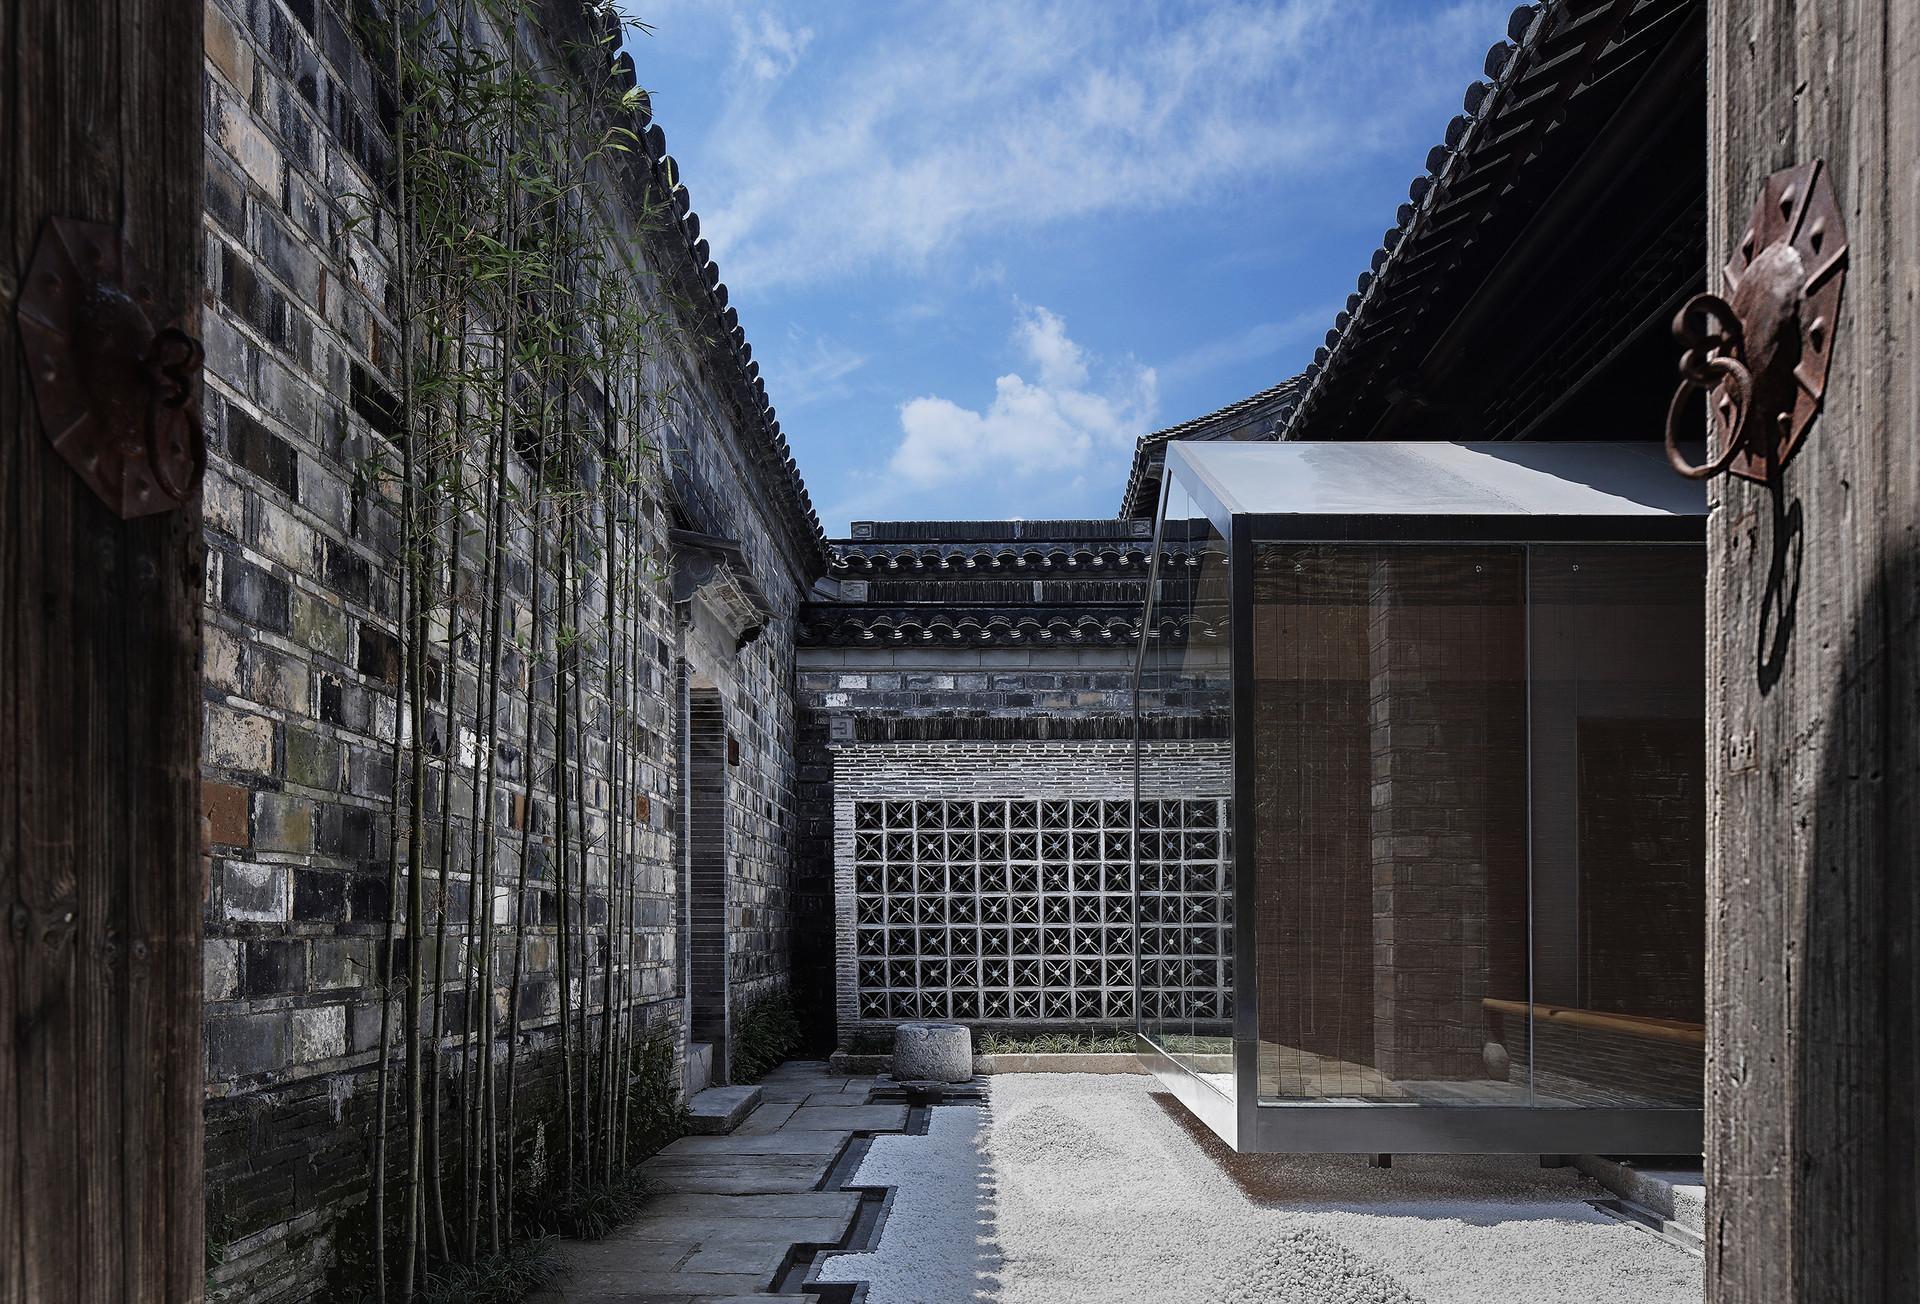 Fuente: MingGu Design